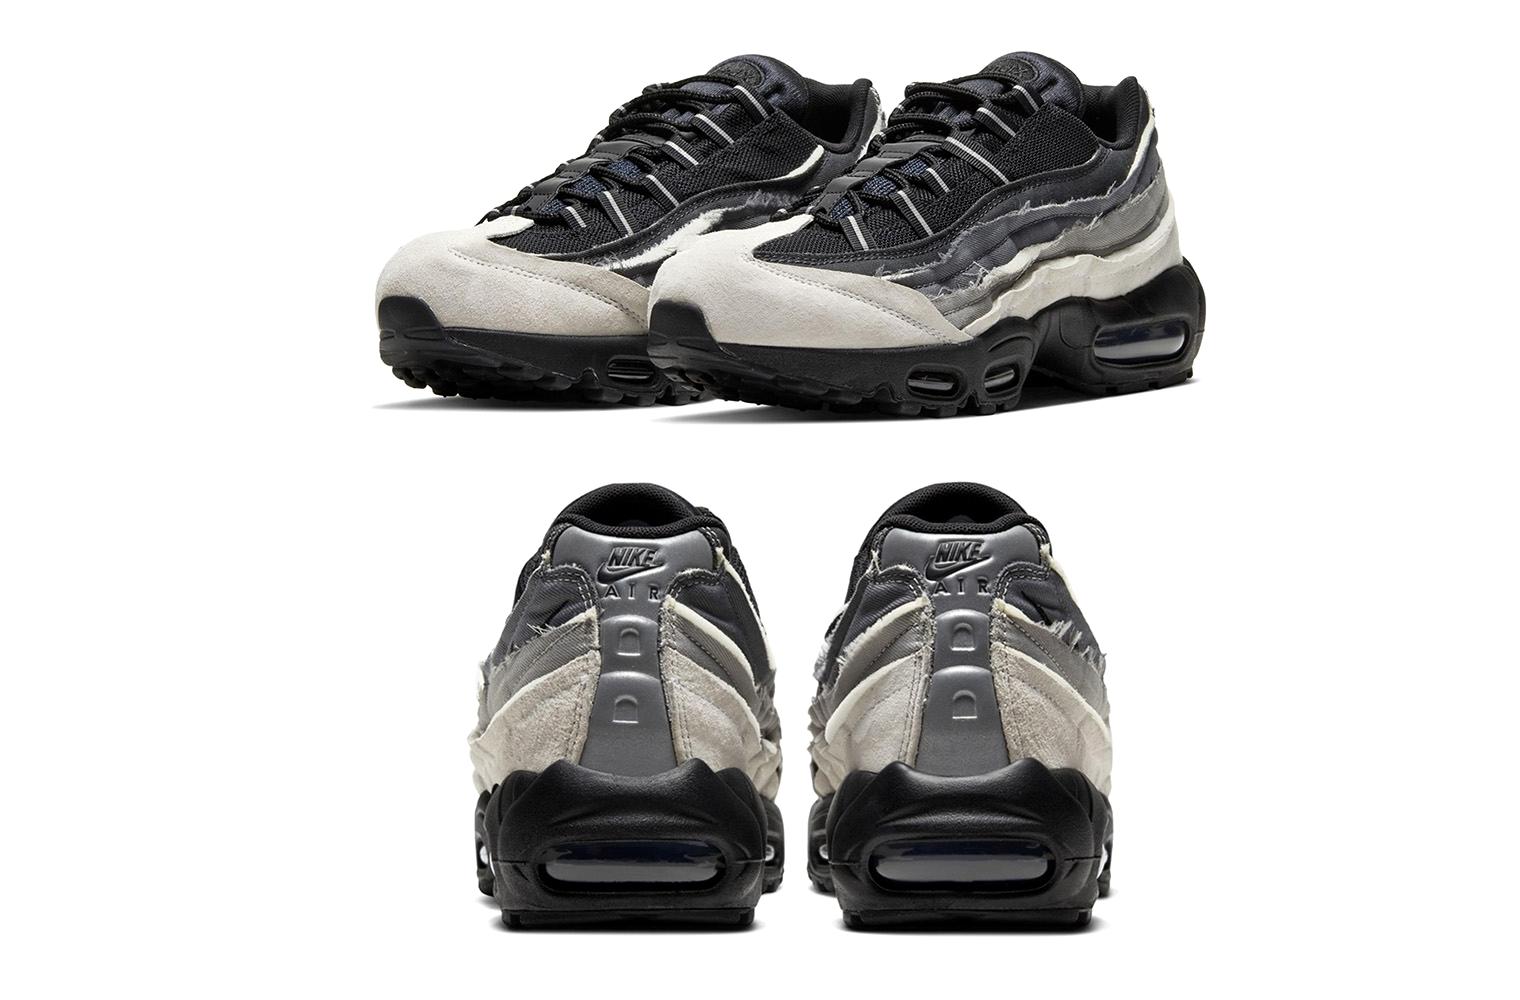 COMME des GARÇONS HOMME PLUS x Nike Air Max 95 Серый